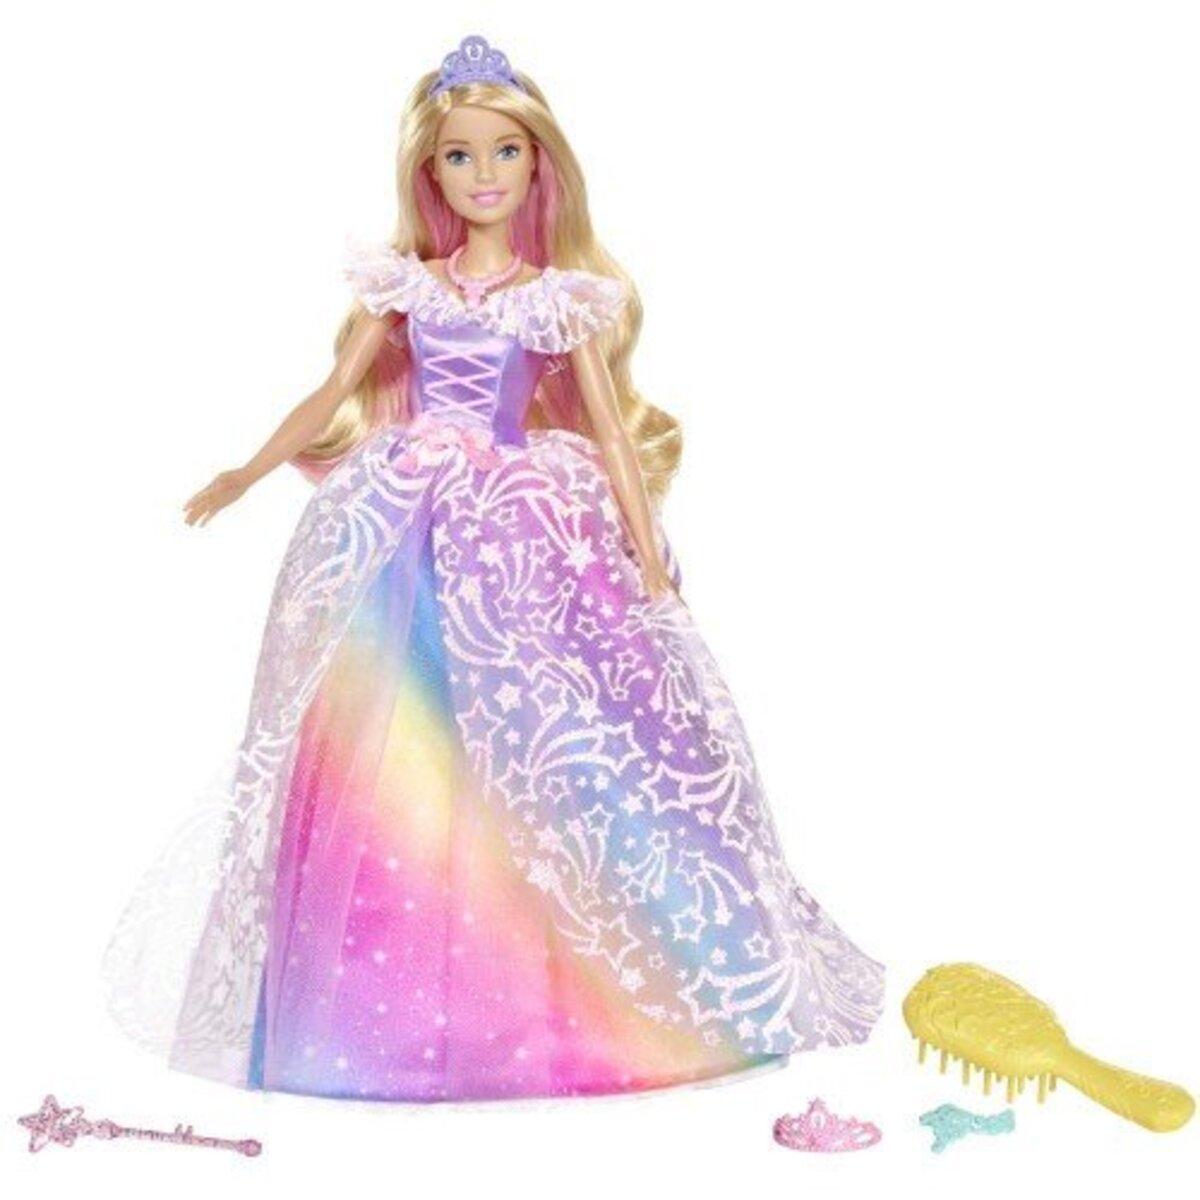 Bild 1 von Barbie Dreamtopia Ultimate Princess blond